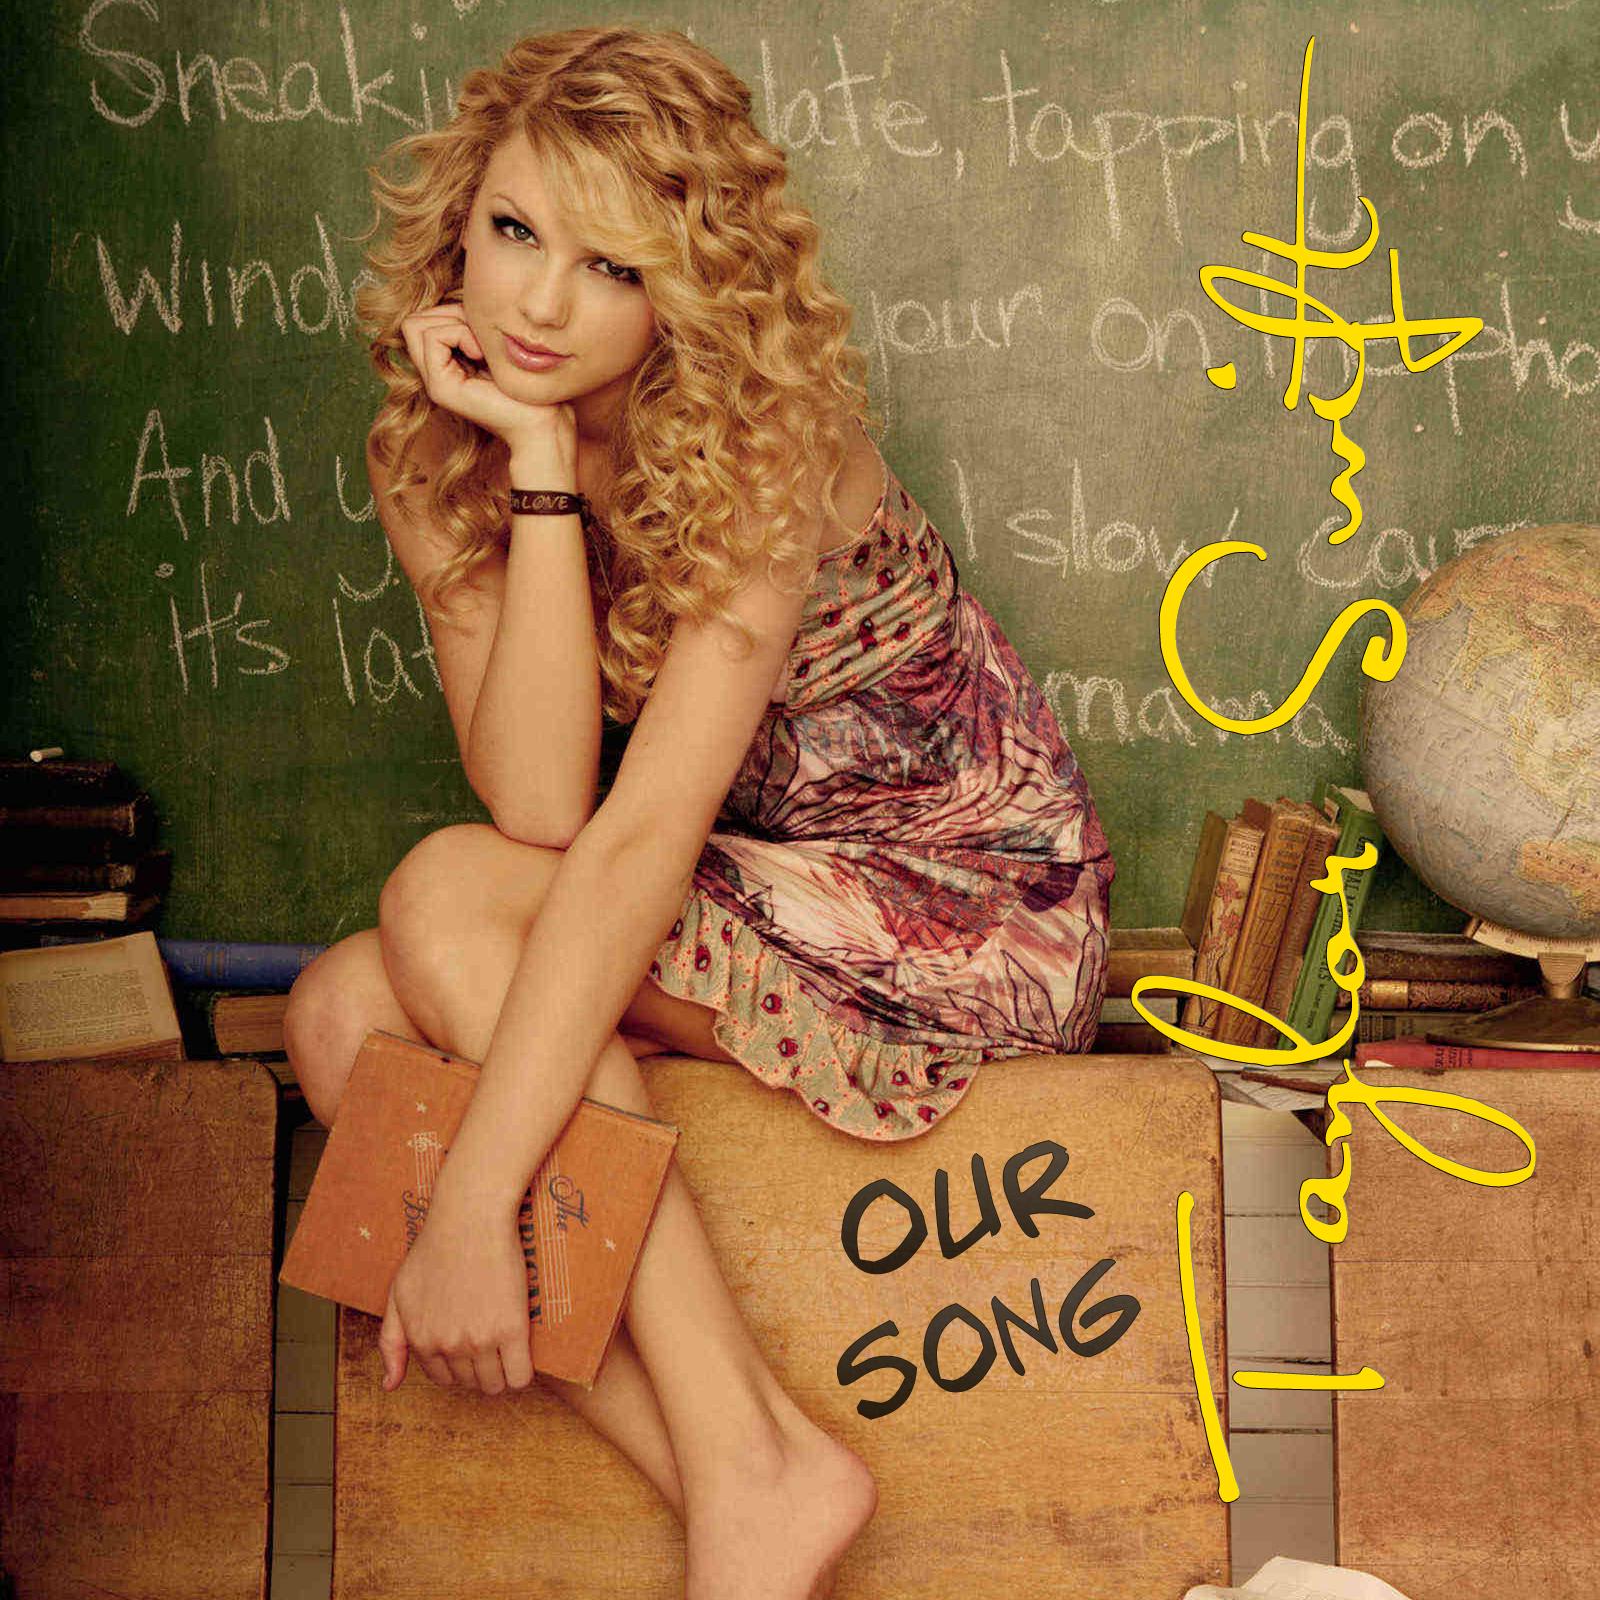 Juego » El Gran Ranking de Taylor Swift [TOP 3 pág 6] - Página 4 Taylor_swift___our_song_by_mhelaonline07-d5sz26q